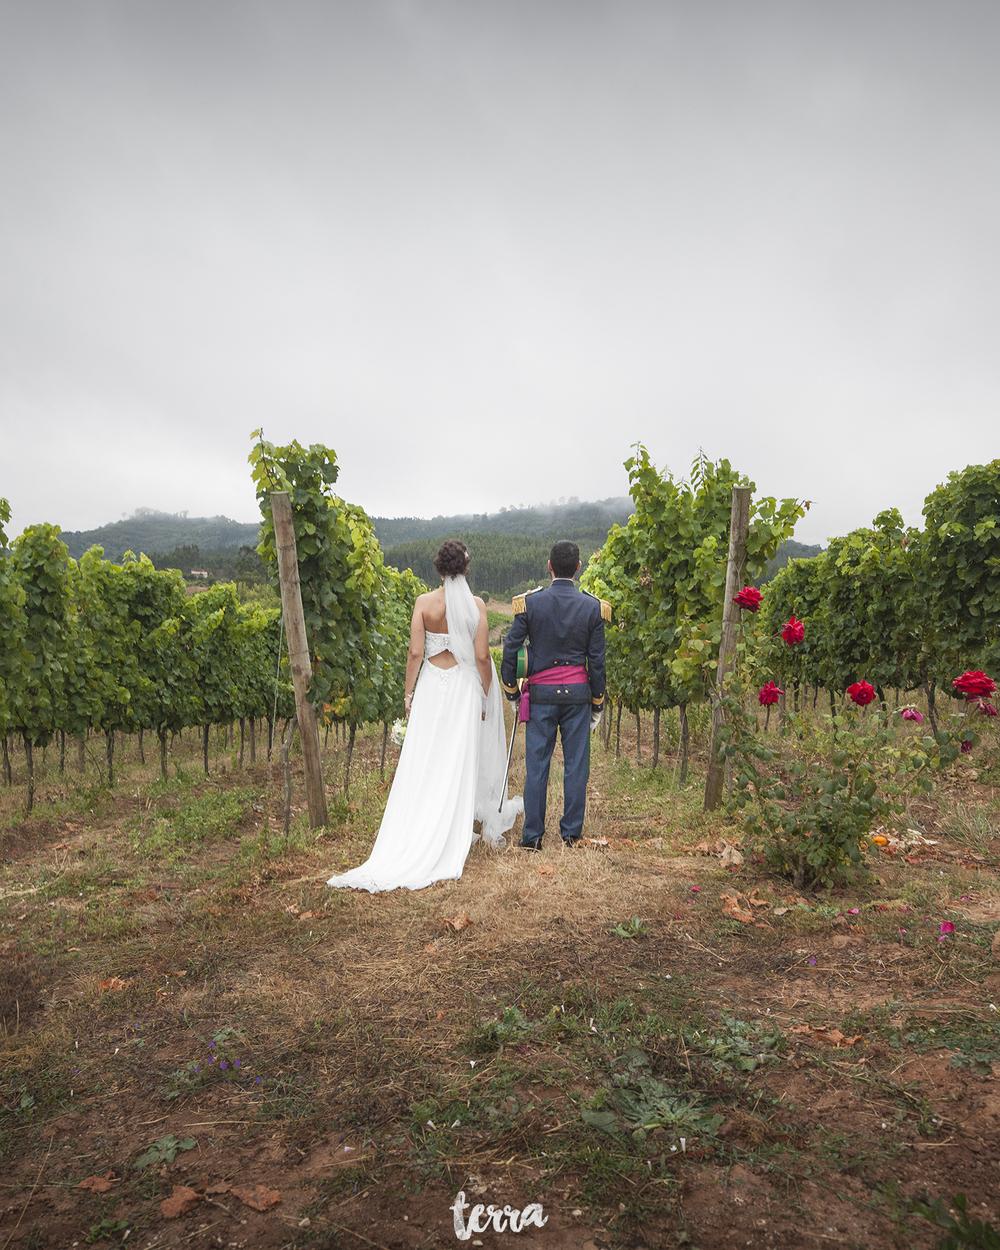 reportagem-fotografica-casamento-quinta-santana-mafra-terra-fotografia-0098.jpg